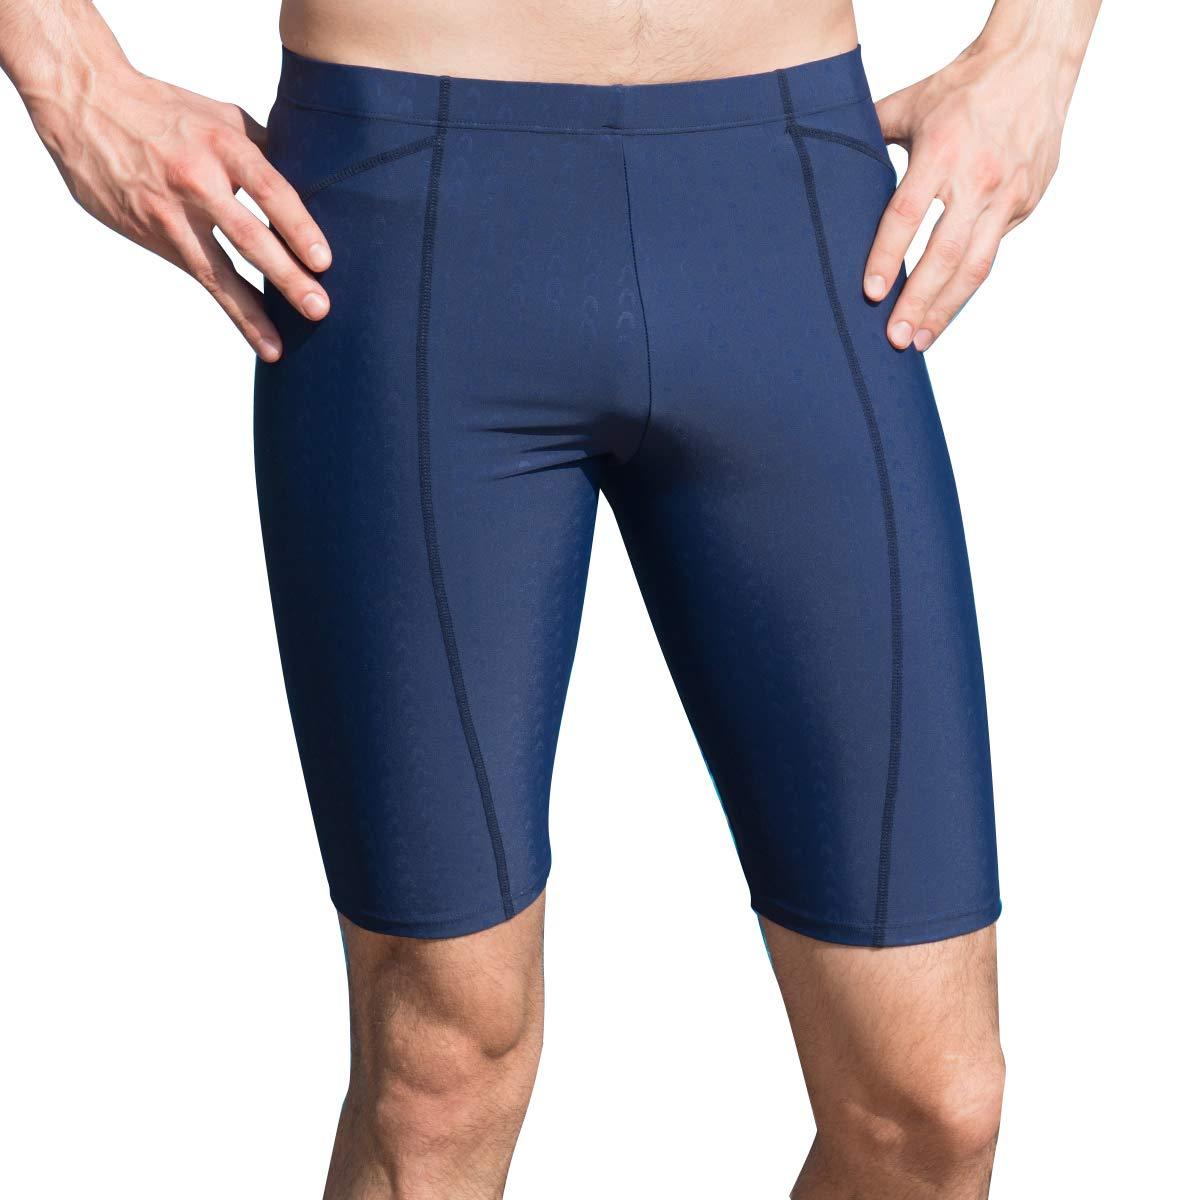 AIEOE Men Jammer Swimwear Mesh Lined Drawstring Adjustable Waistline High Elastic Swim Trunk XS Black//Red